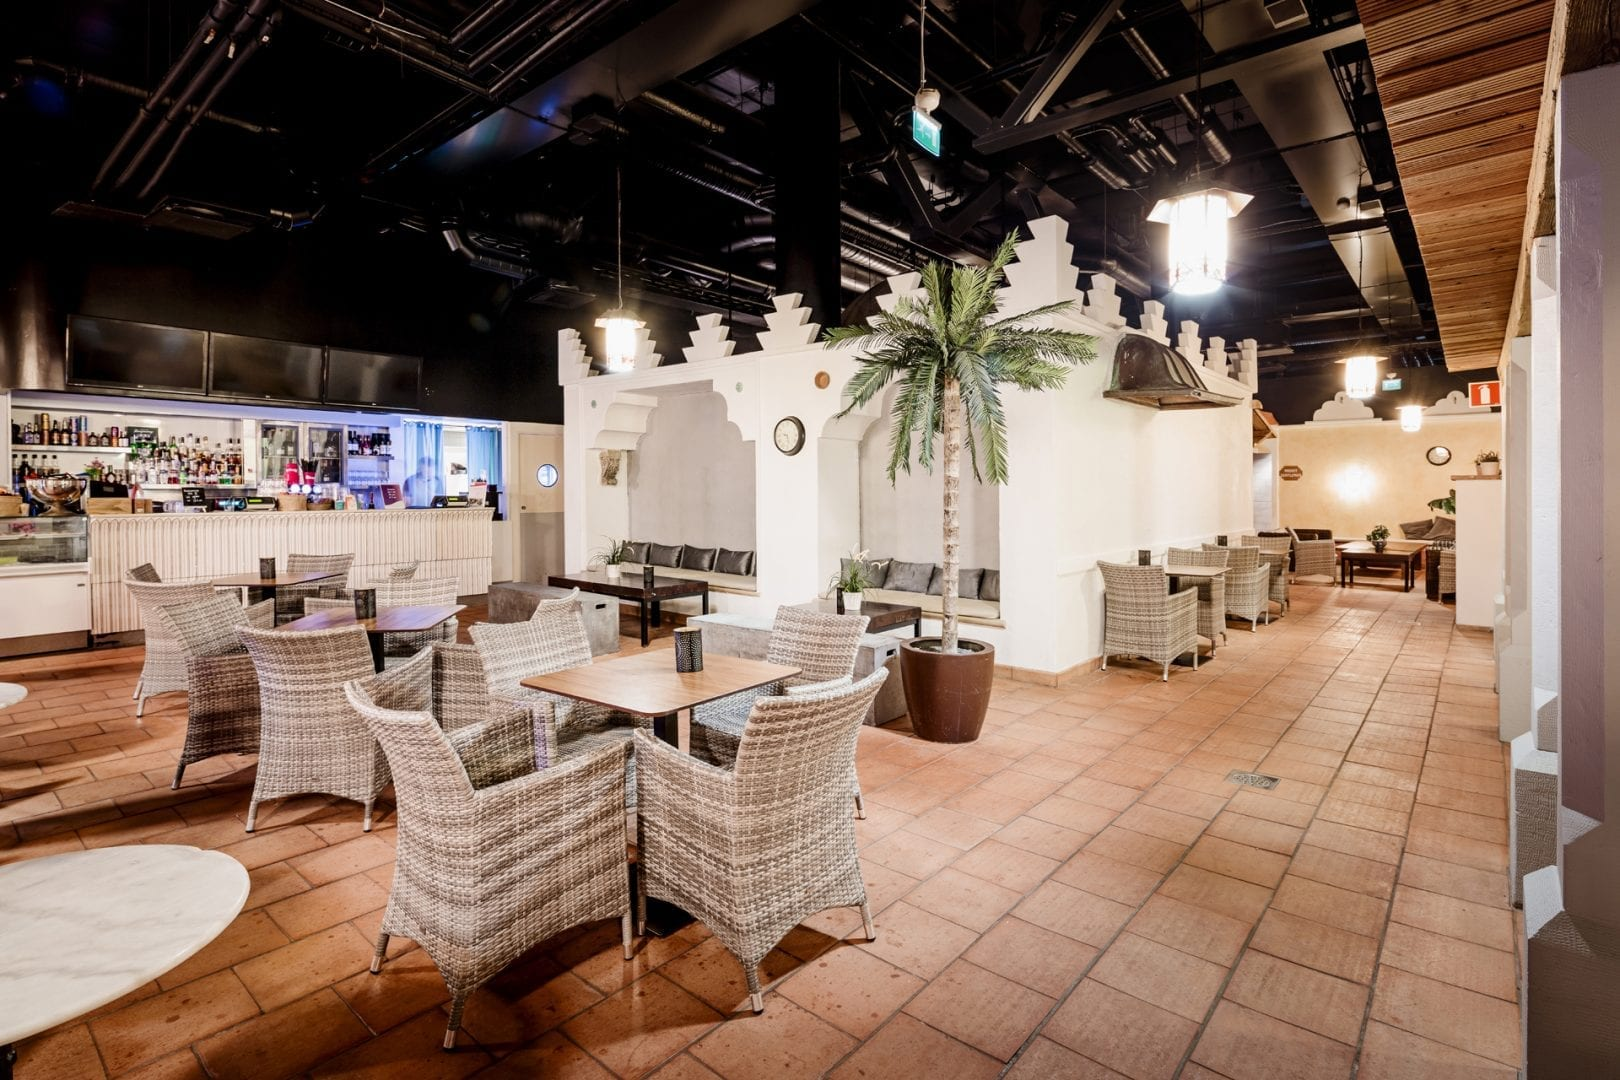 Flamingo Spa Cafe aikuisten puoli